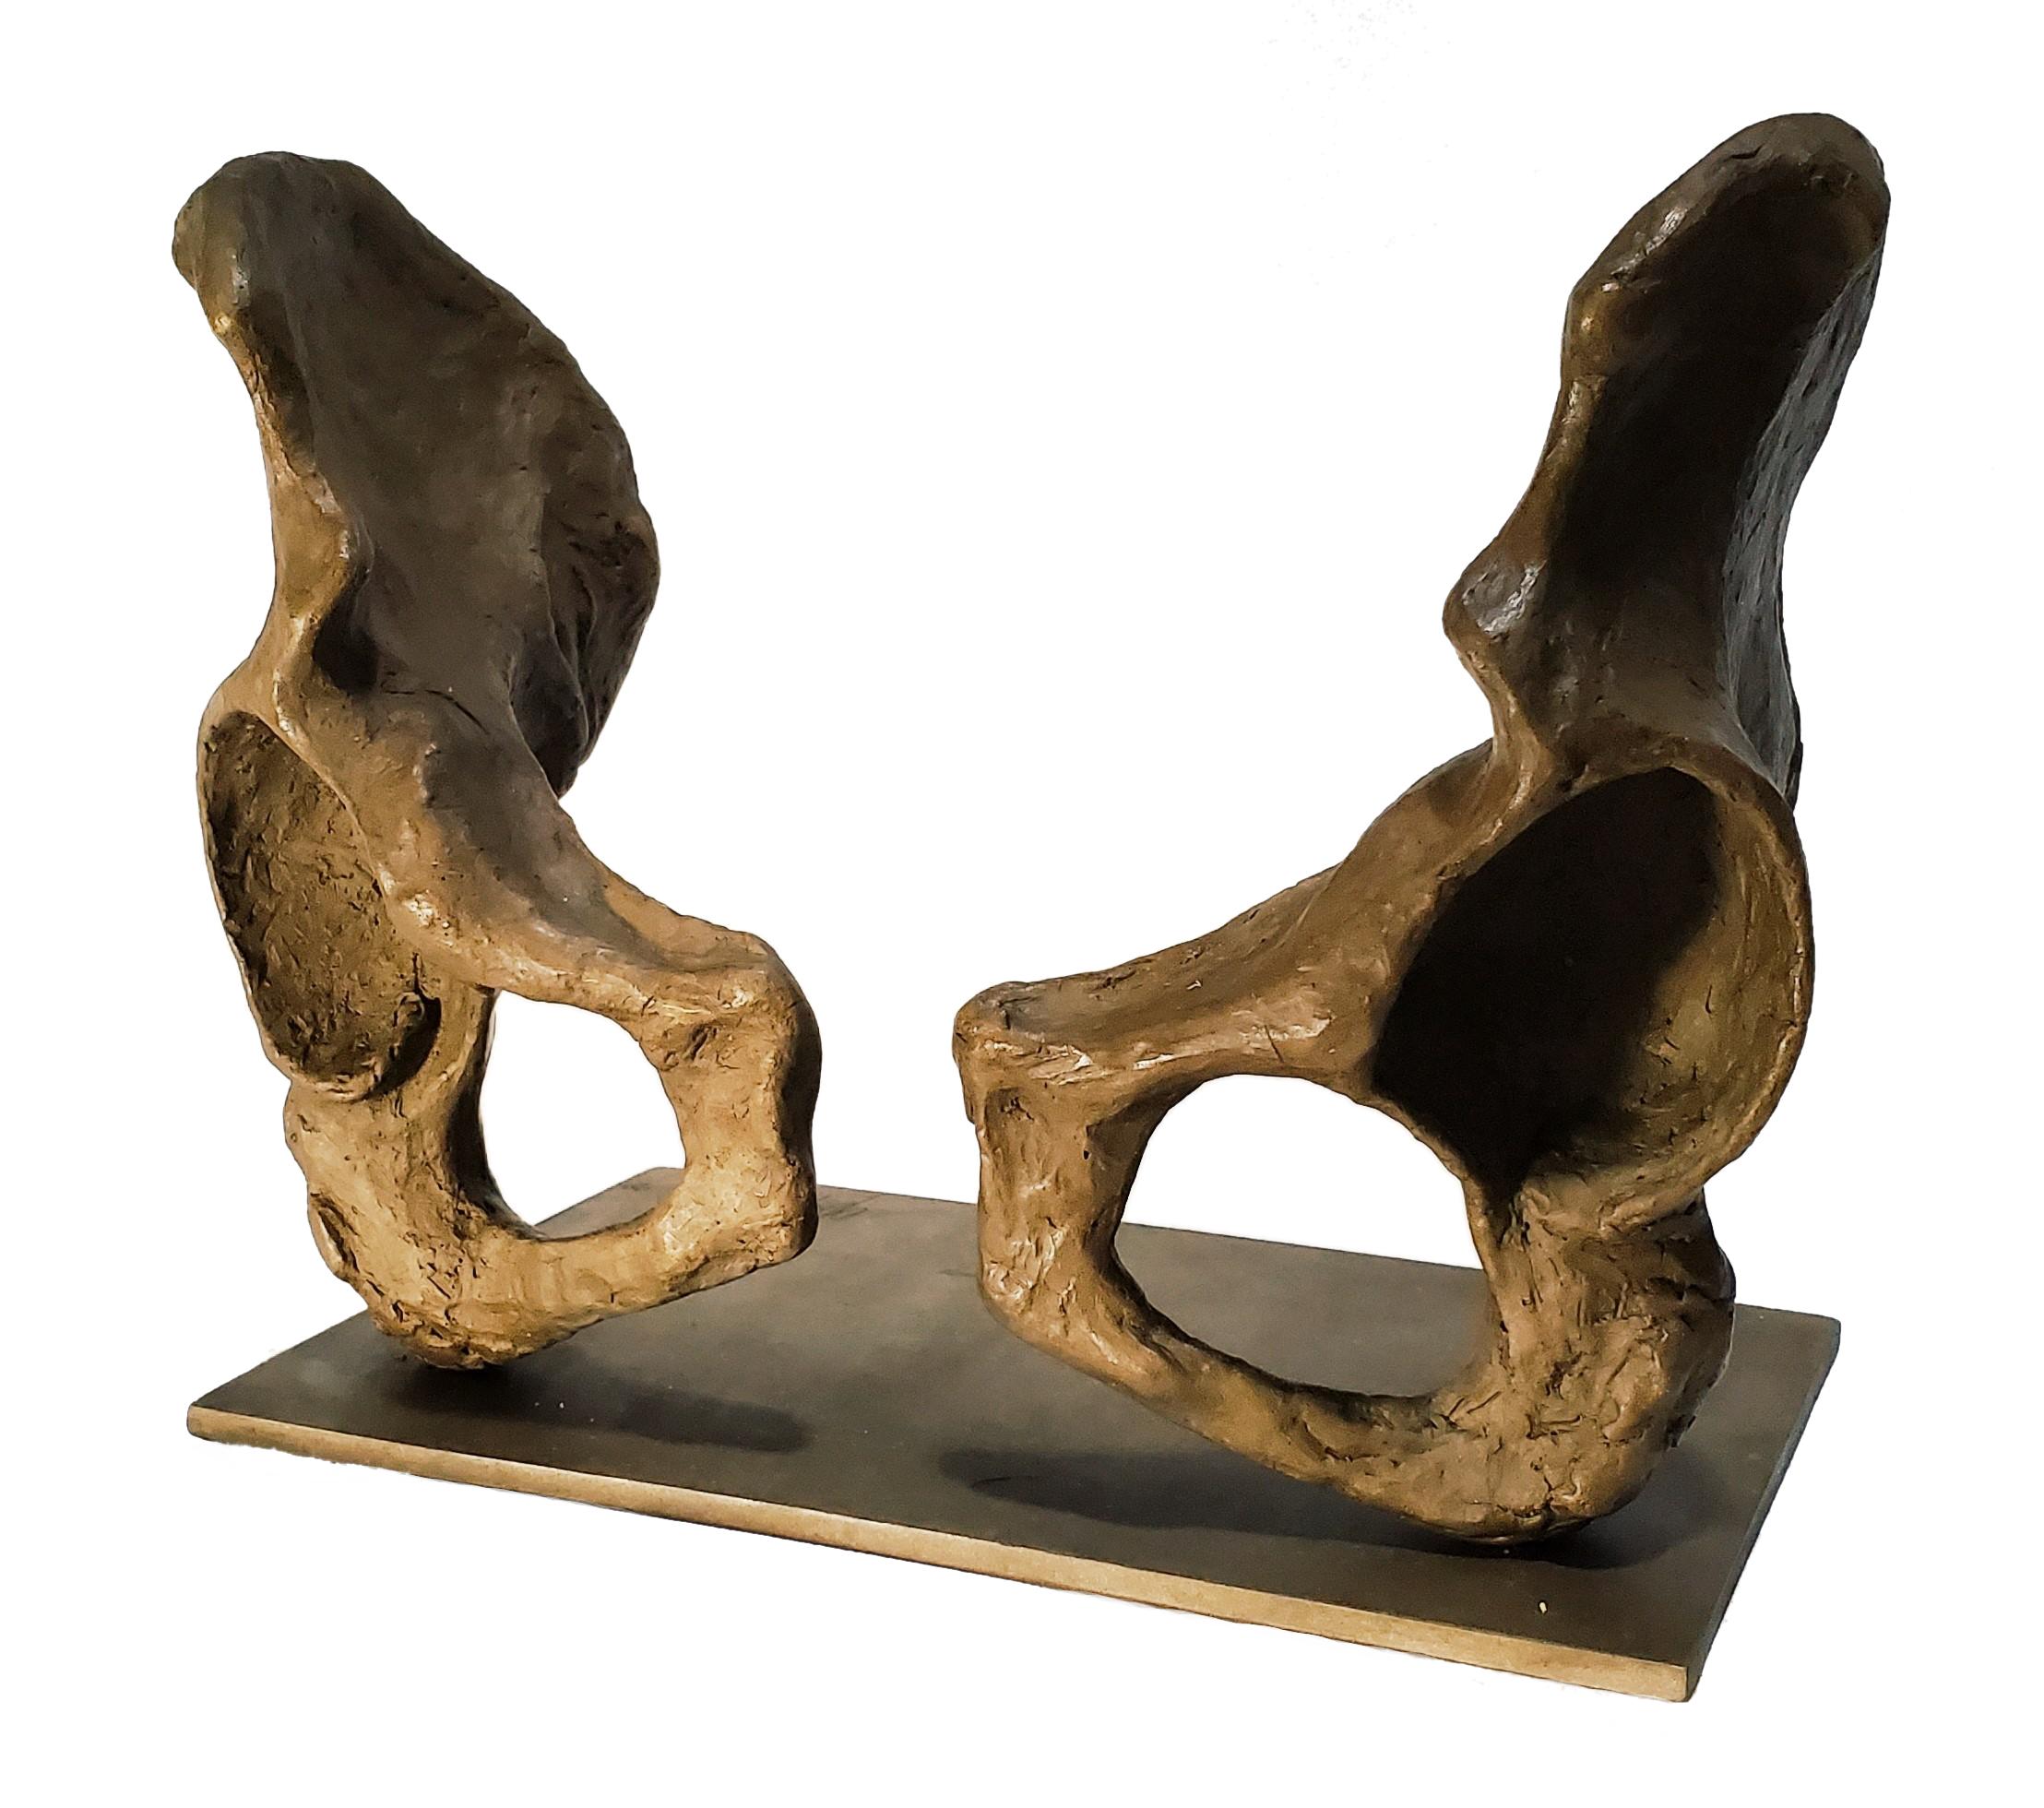 pelvis skeleton bronze sculpture coxal bones female anatomy